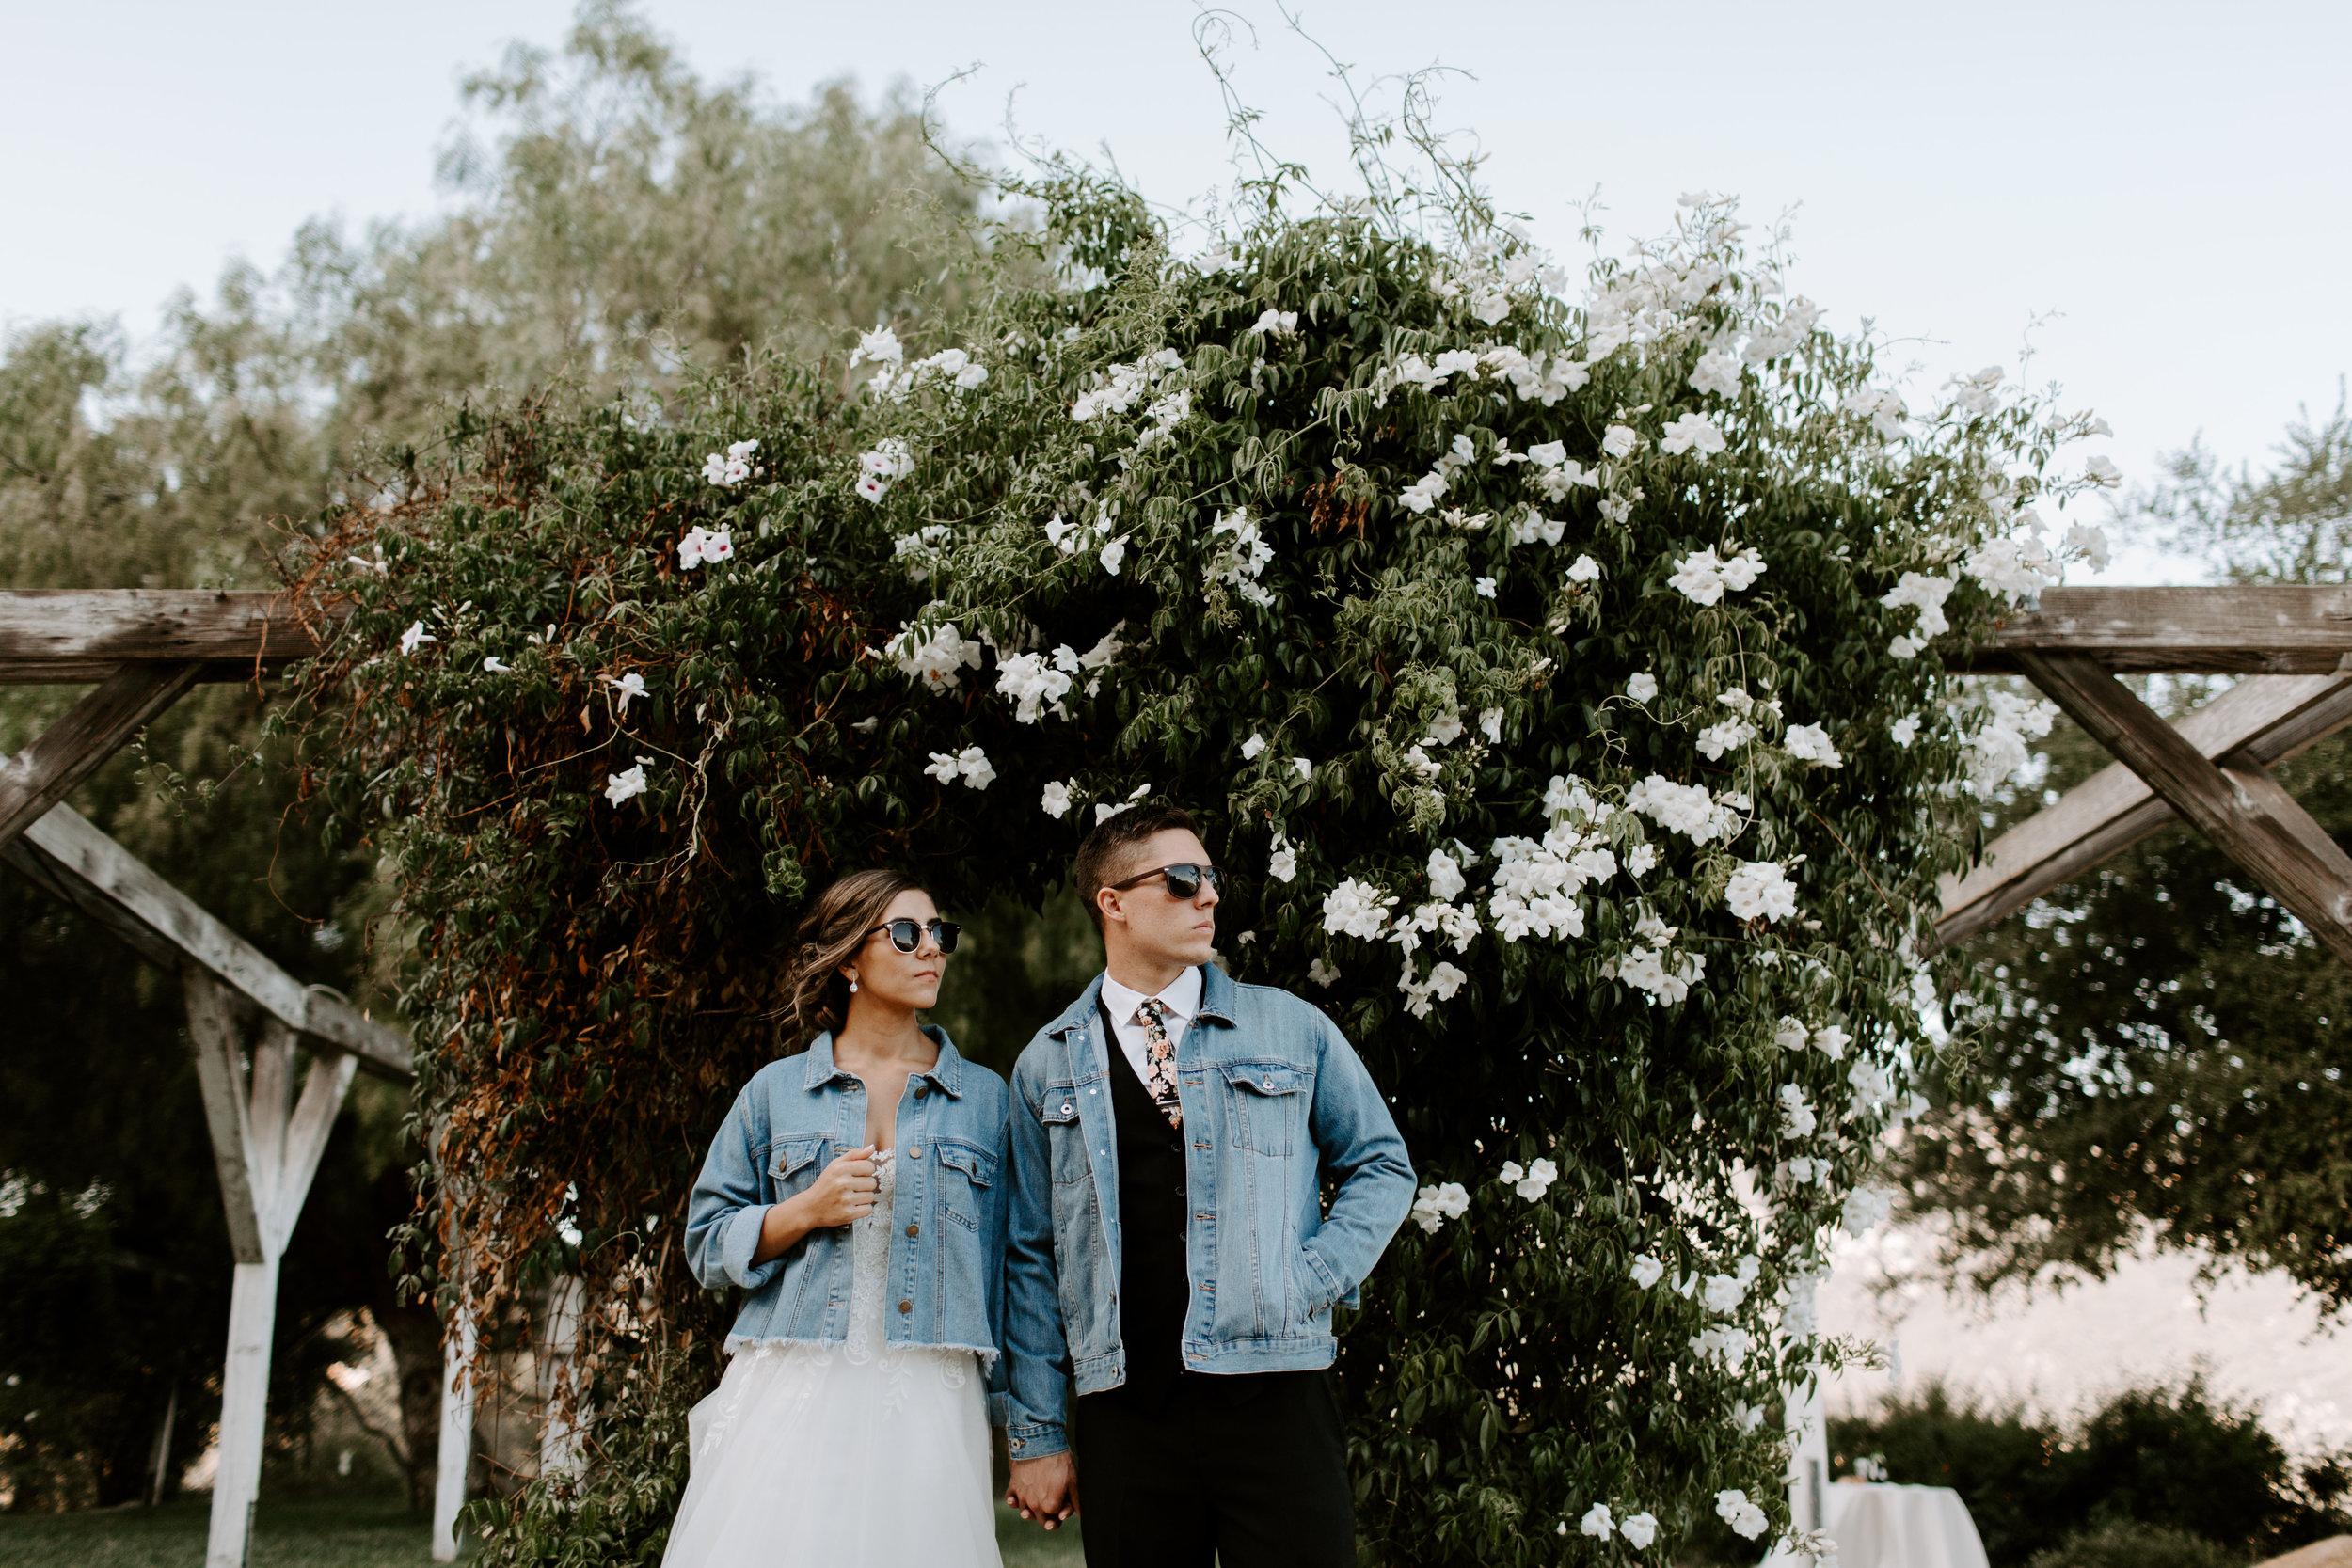 kate+zack_wedding_secludedgardenestate_temecula_madisonrylee_0747.jpg